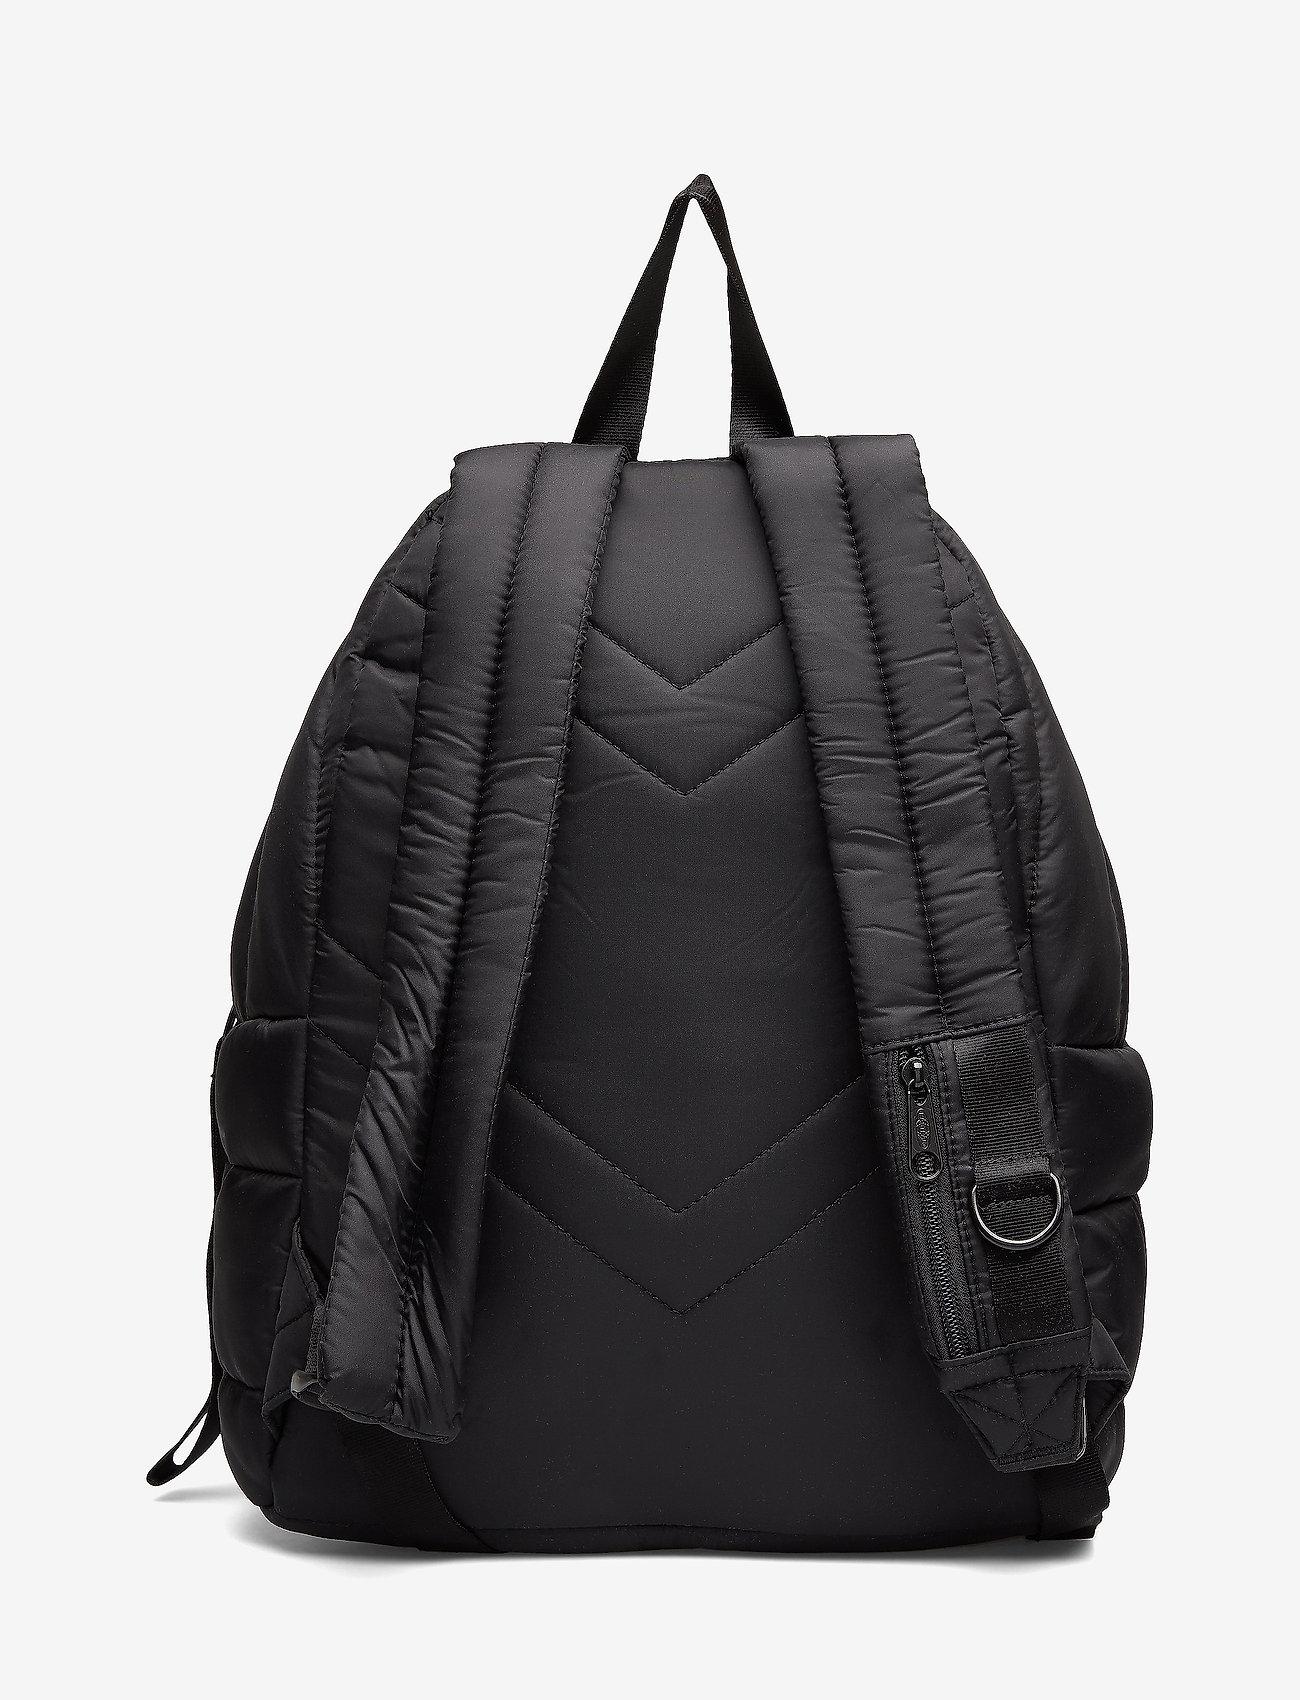 Eastpak - PADDED PAK'R - plecaki - puffed black - 1